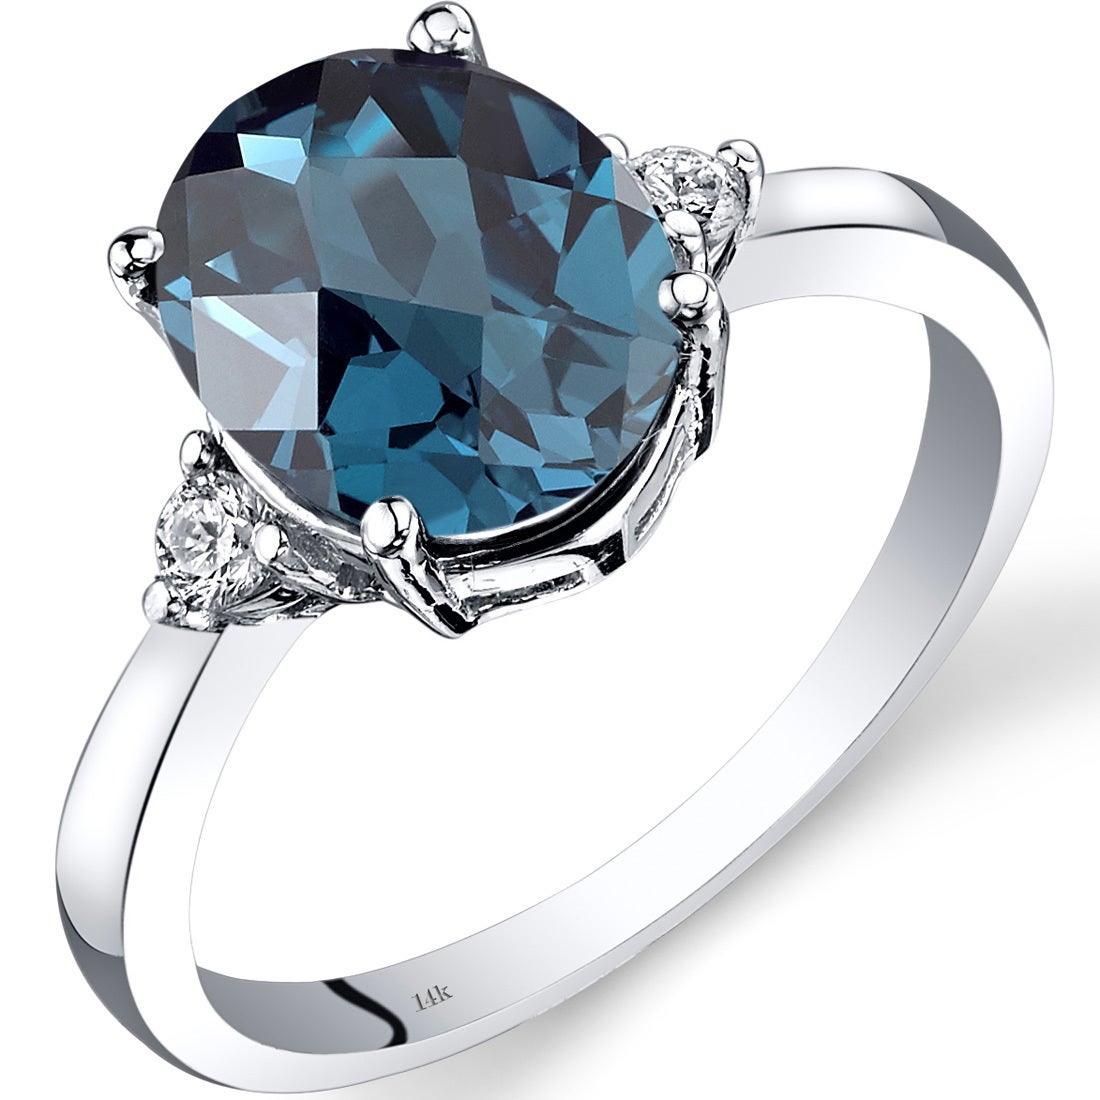 14K White Gold Diamond /& Blue Topaz December Oval Stone Ring Size 7